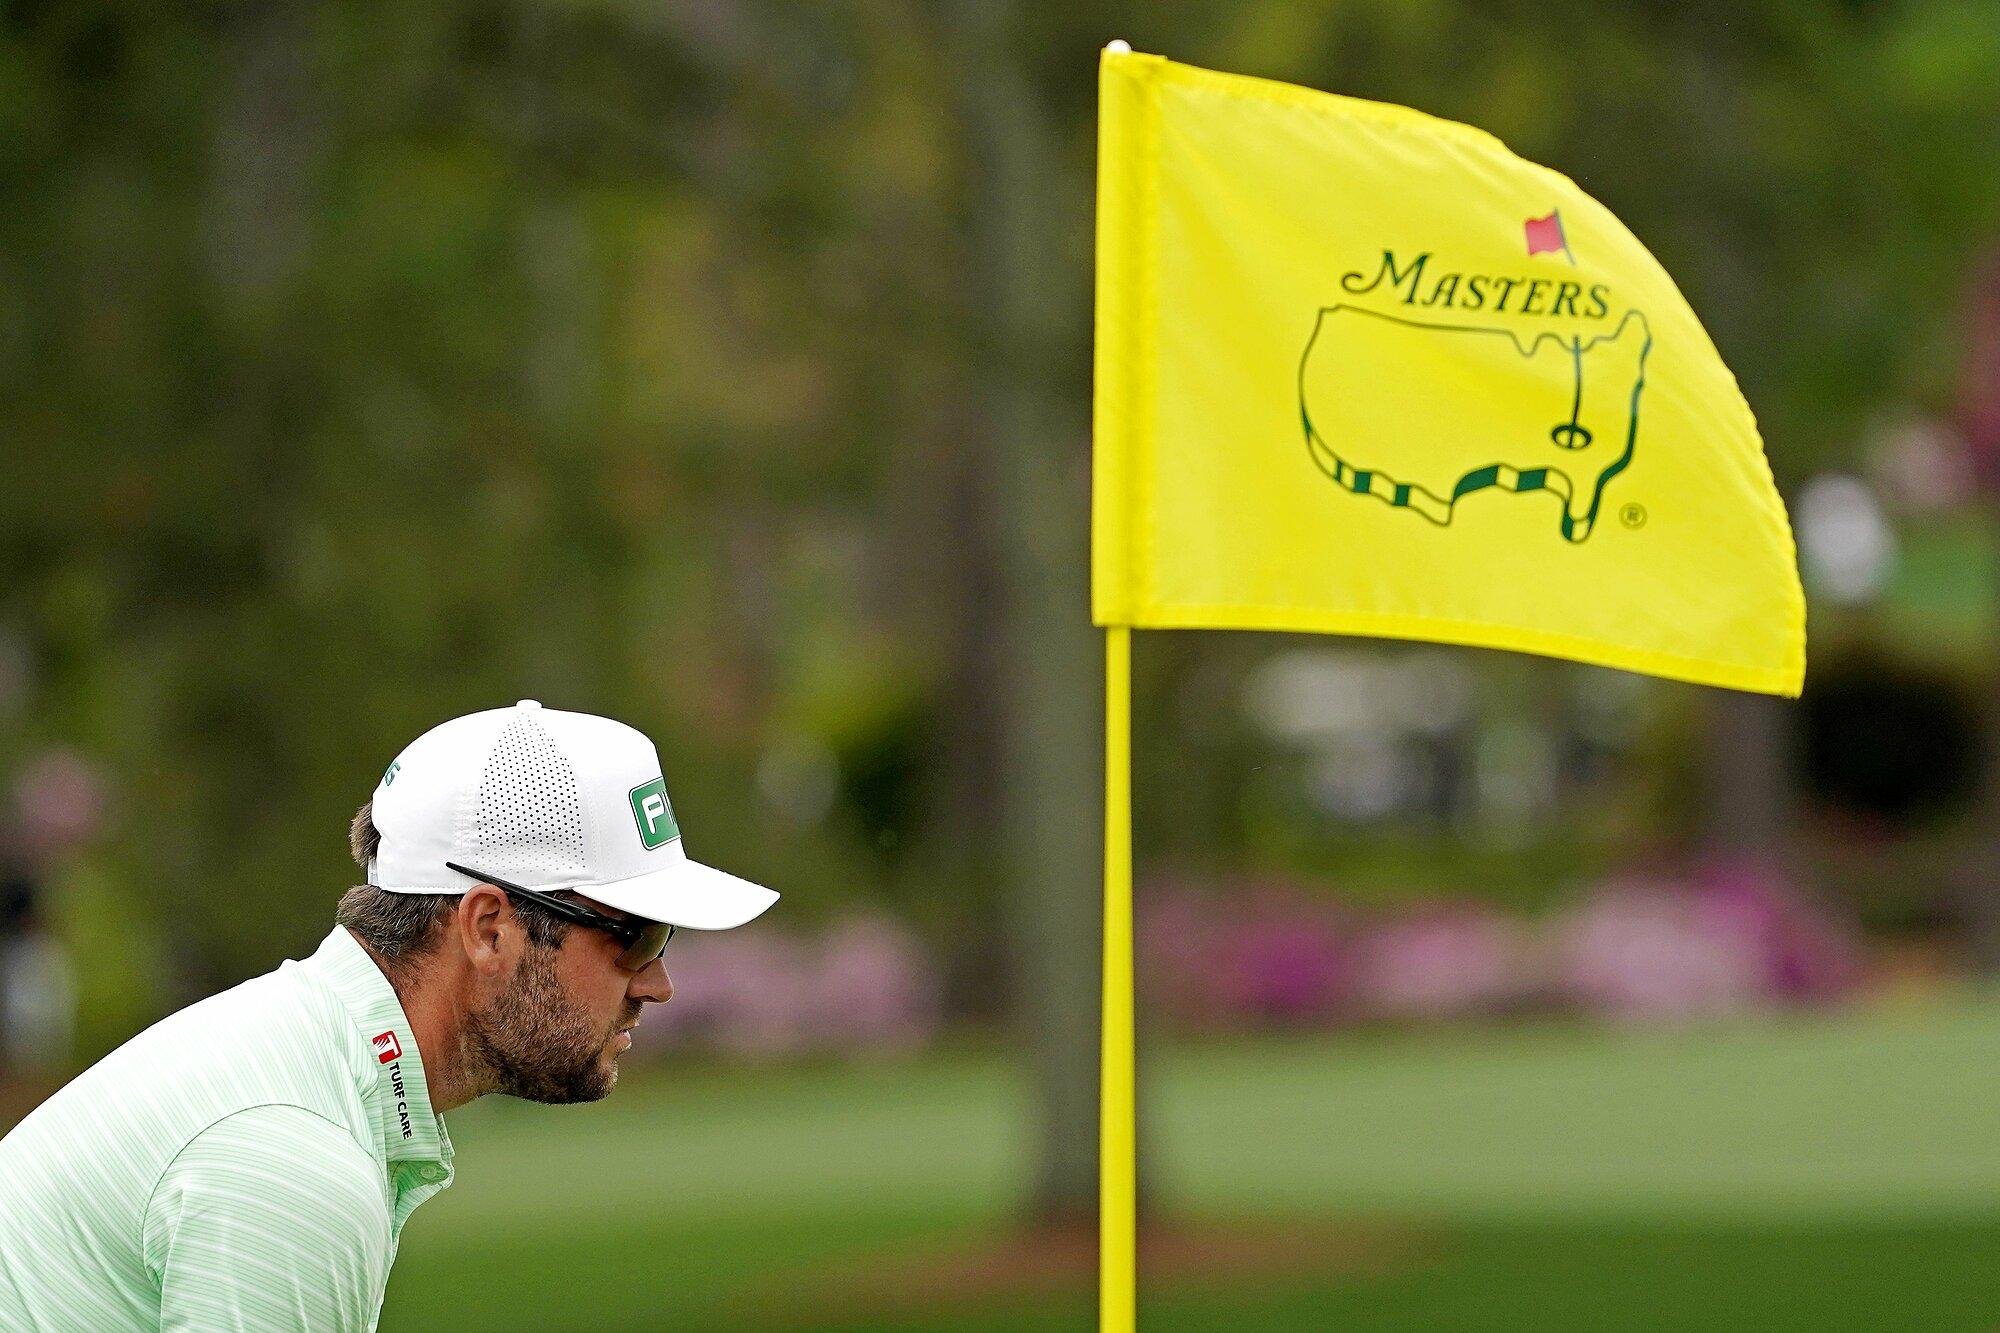 Conners là golfer thứ hai hole-in-one tại Masters 2021. Ảnh: The Masters